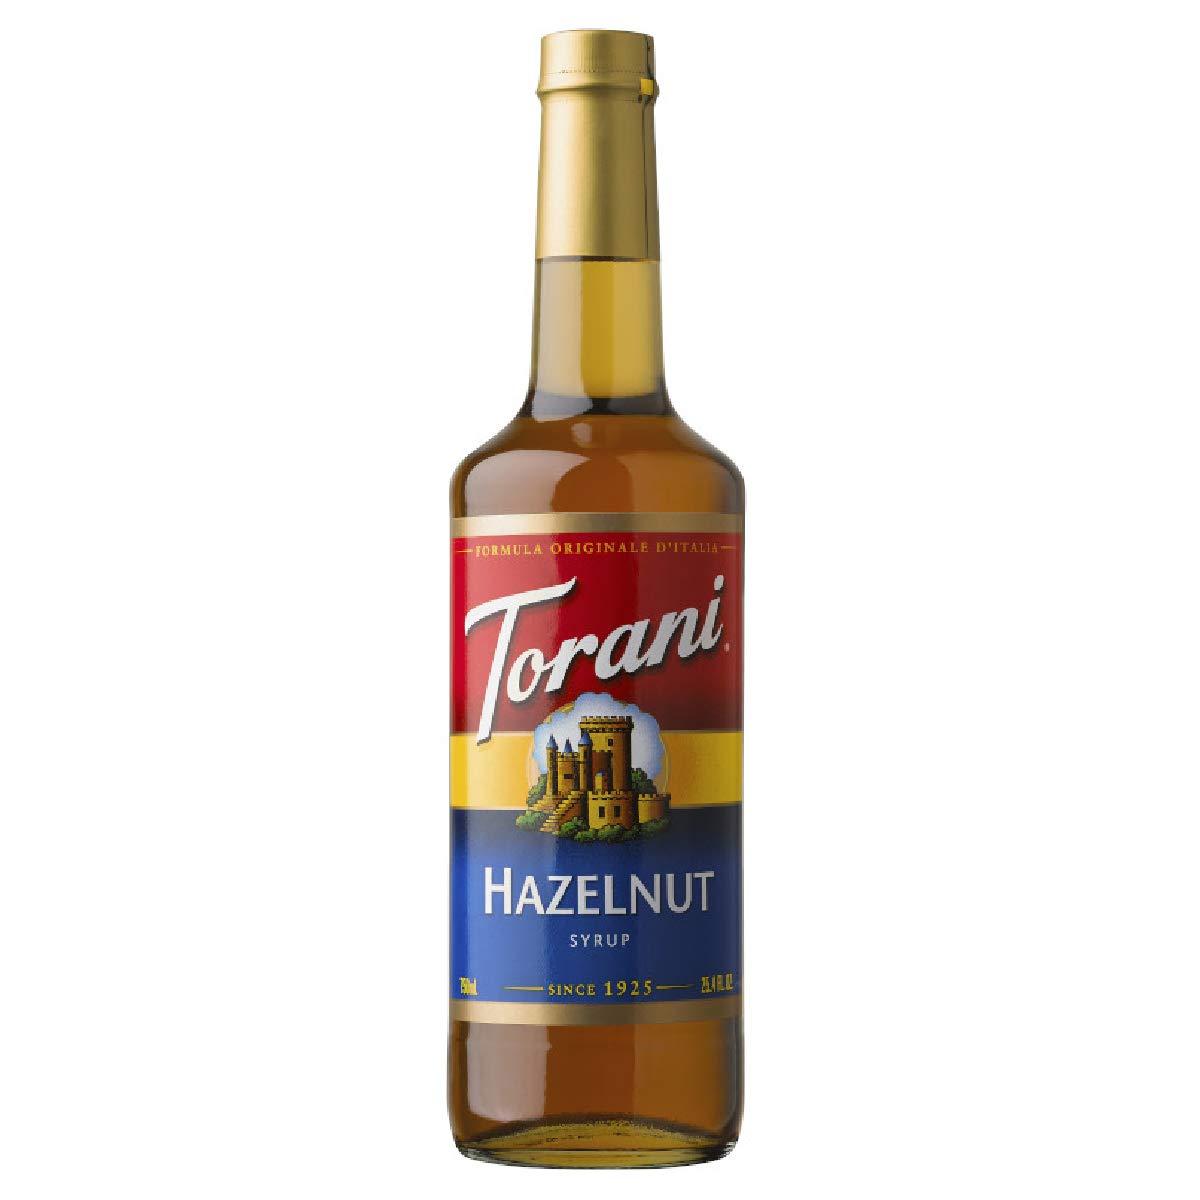 Torani Hazelnut Syrup Max Very popular! 47% OFF 750 ml